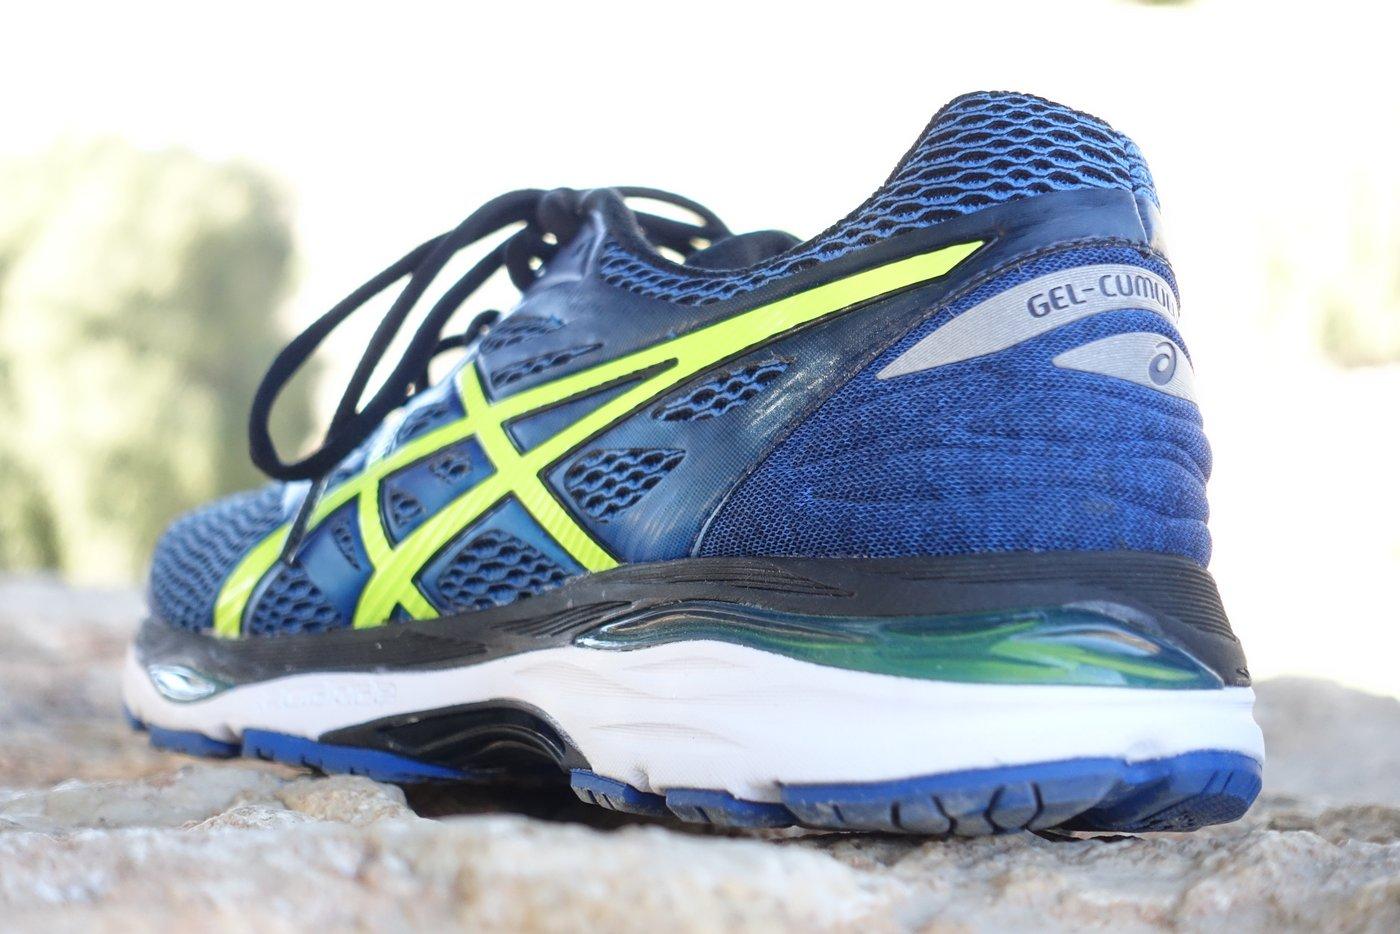 נעלי ריצה של אסיקס